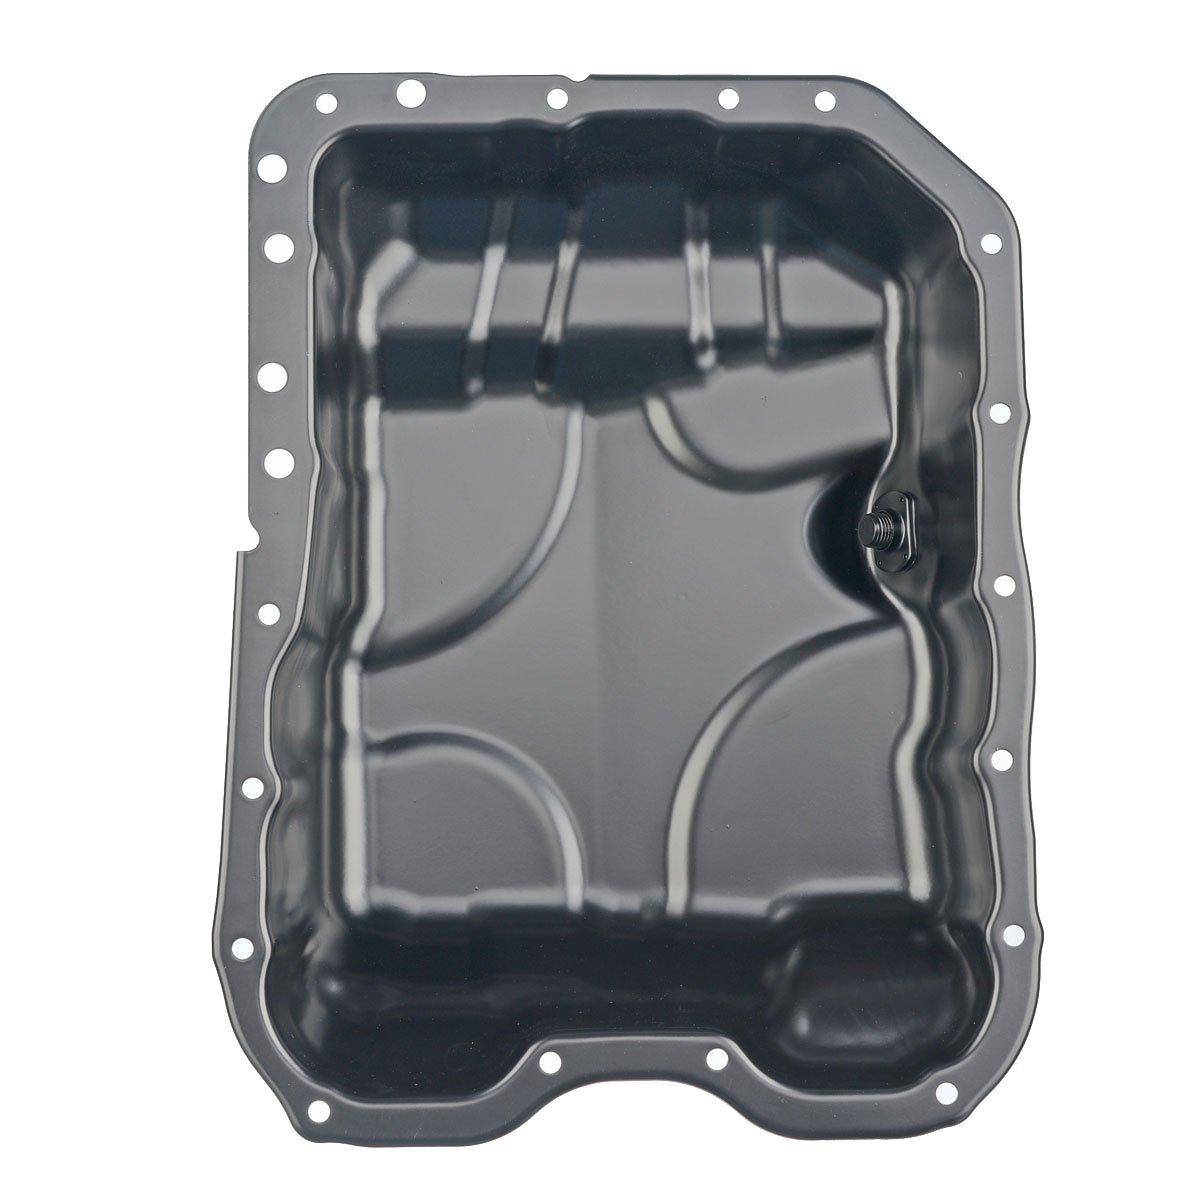 A-Premium Engine Oil pan for Chrysler 200 2015 Dodge Dart 2013-2015 Jeep Cherokee 2014-2015 2.0L 2.4L